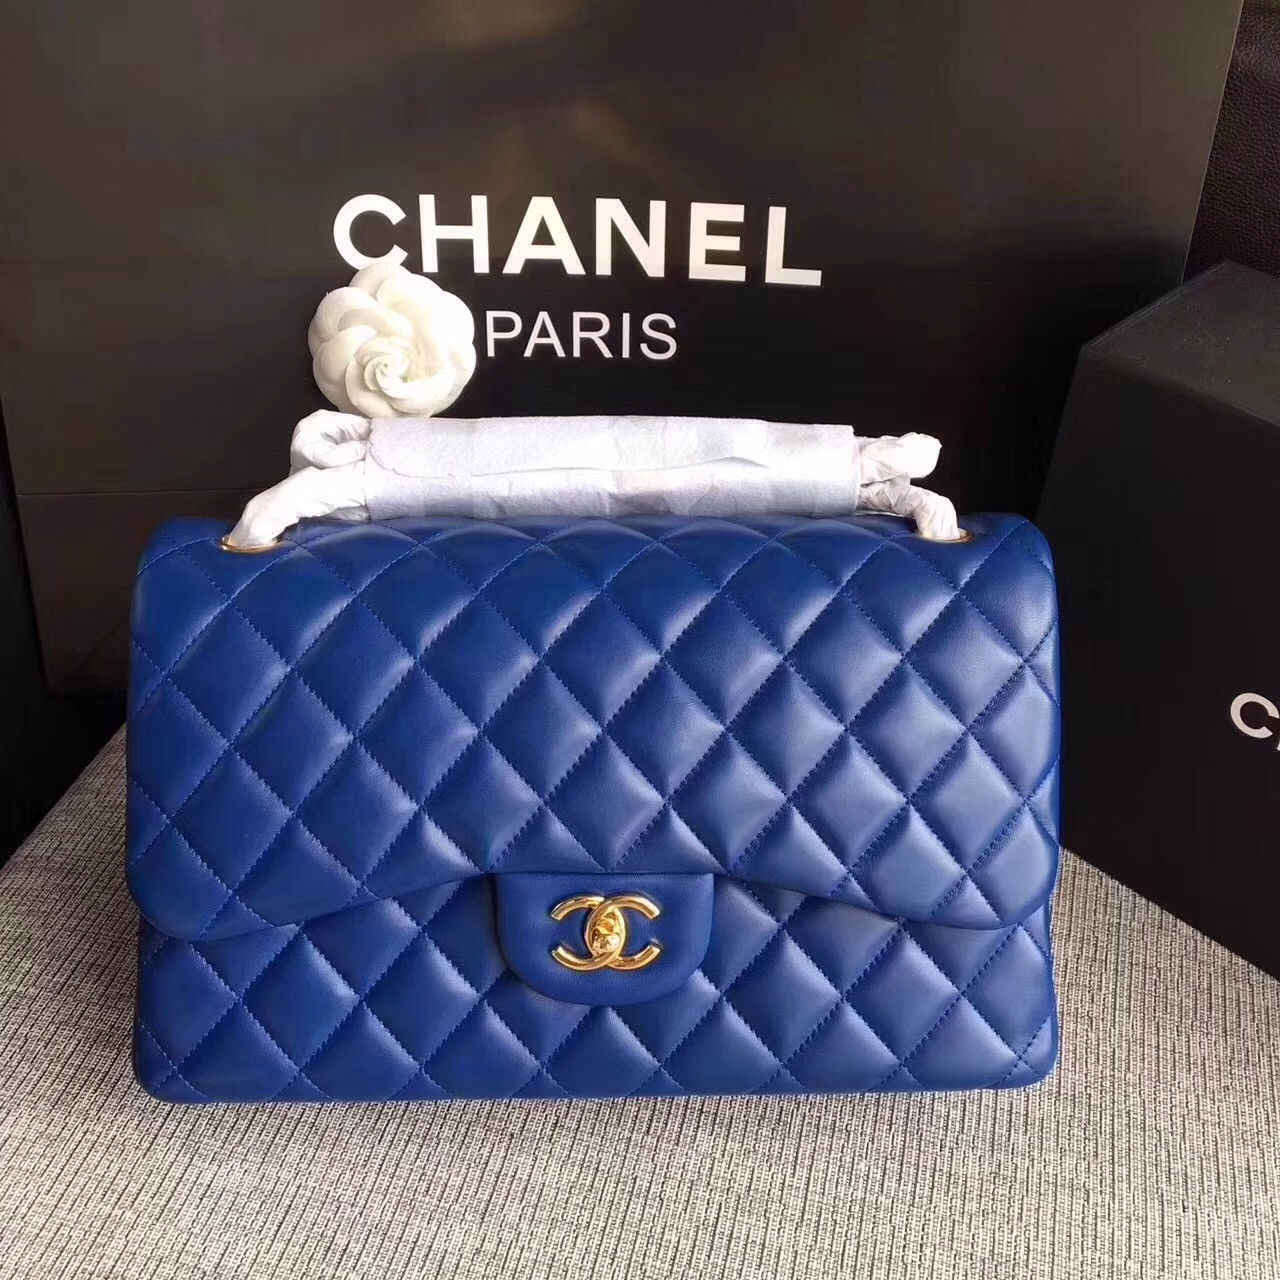 Chanel LARGE CLASSIC HANDBAG Blue Lambskin - Bella Vita Moda d3b898b425e63